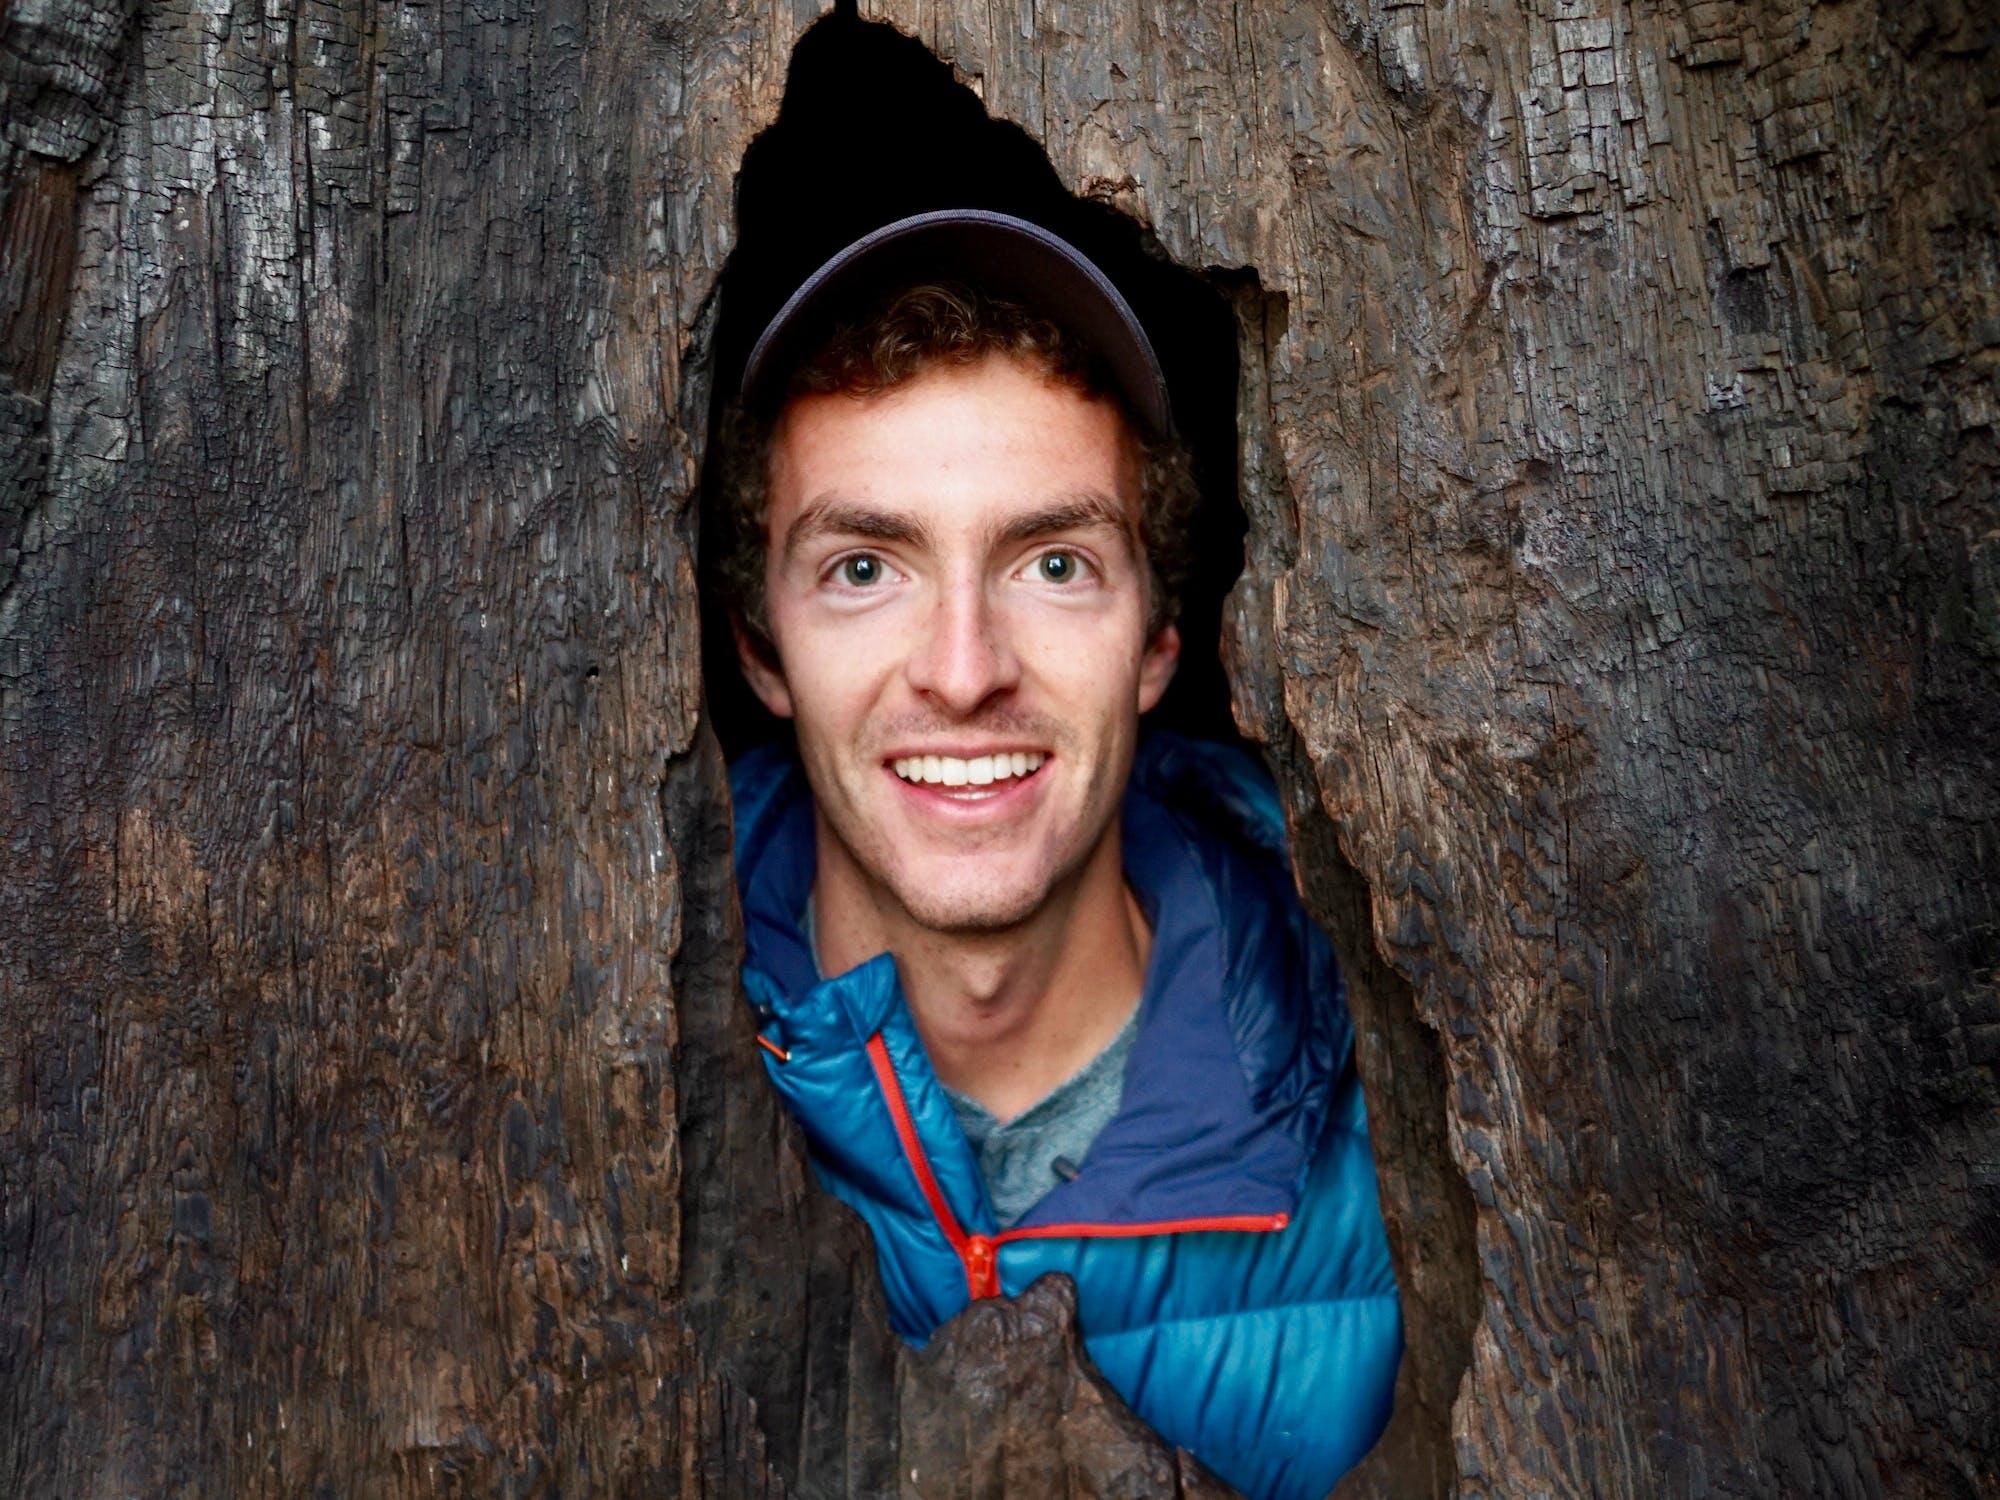 Smiling male peering through tree trunk